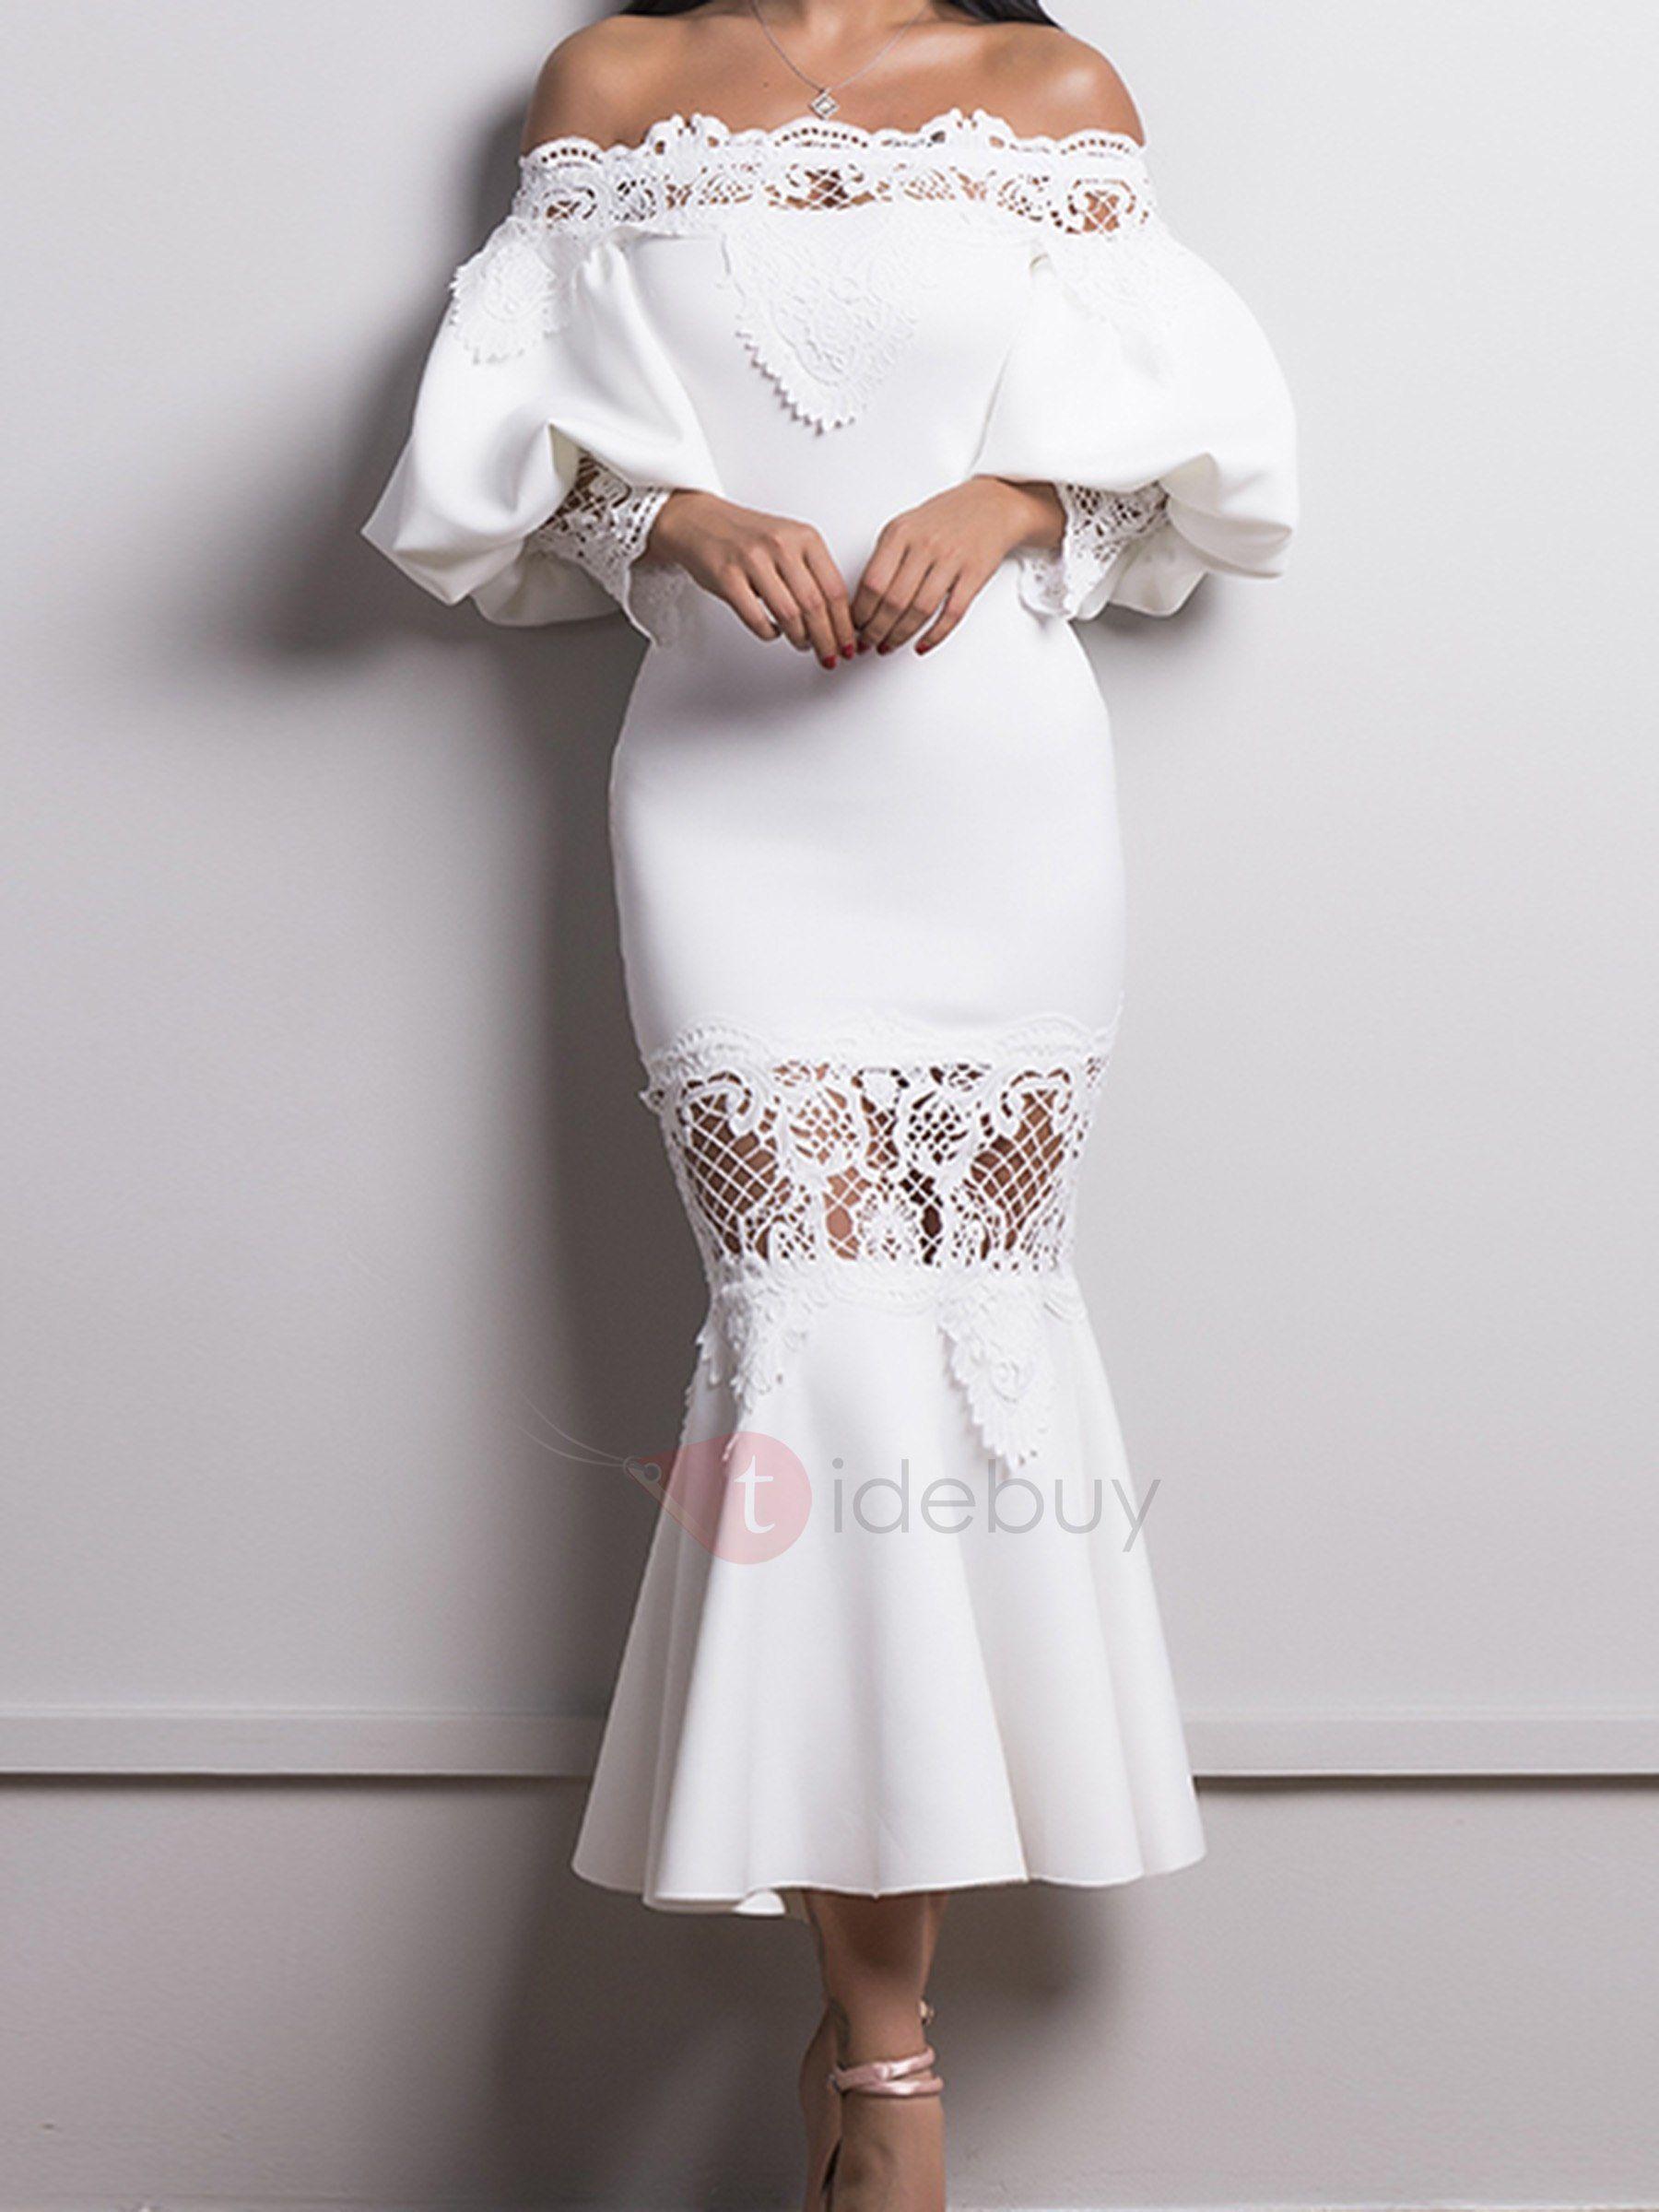 Black lace dress for summer wedding  Slash Neck Mermaid Backless Womenus Bodycon Dress  Fall u Winter